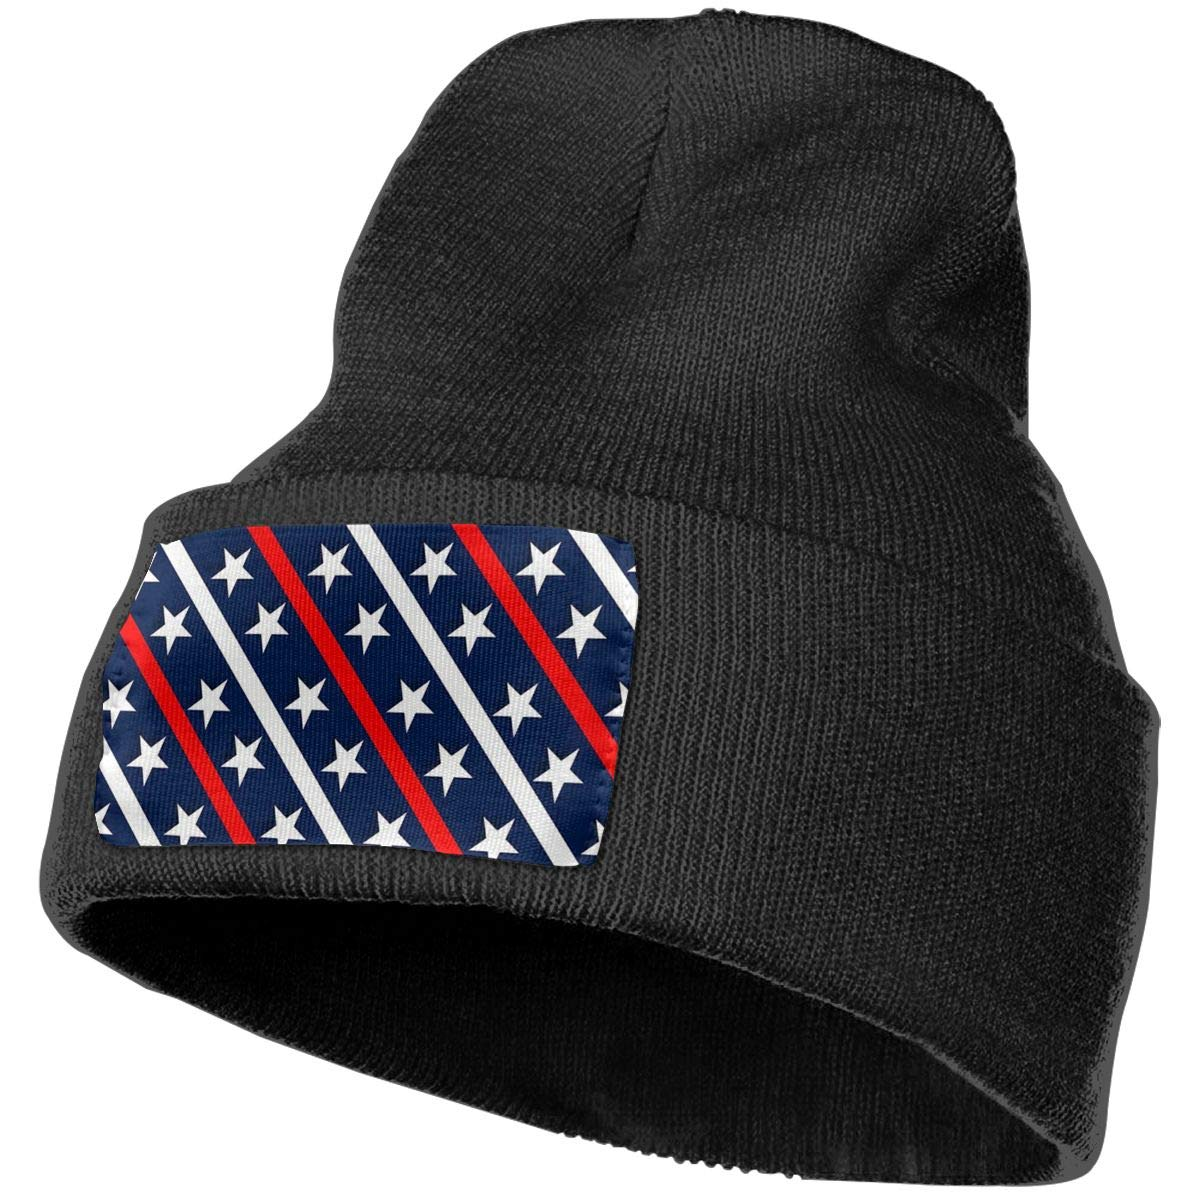 100/% Acrylic Acid Mas Beanie Hat Ruin Stars American Flag Fashion Knitting Hat for Men Women